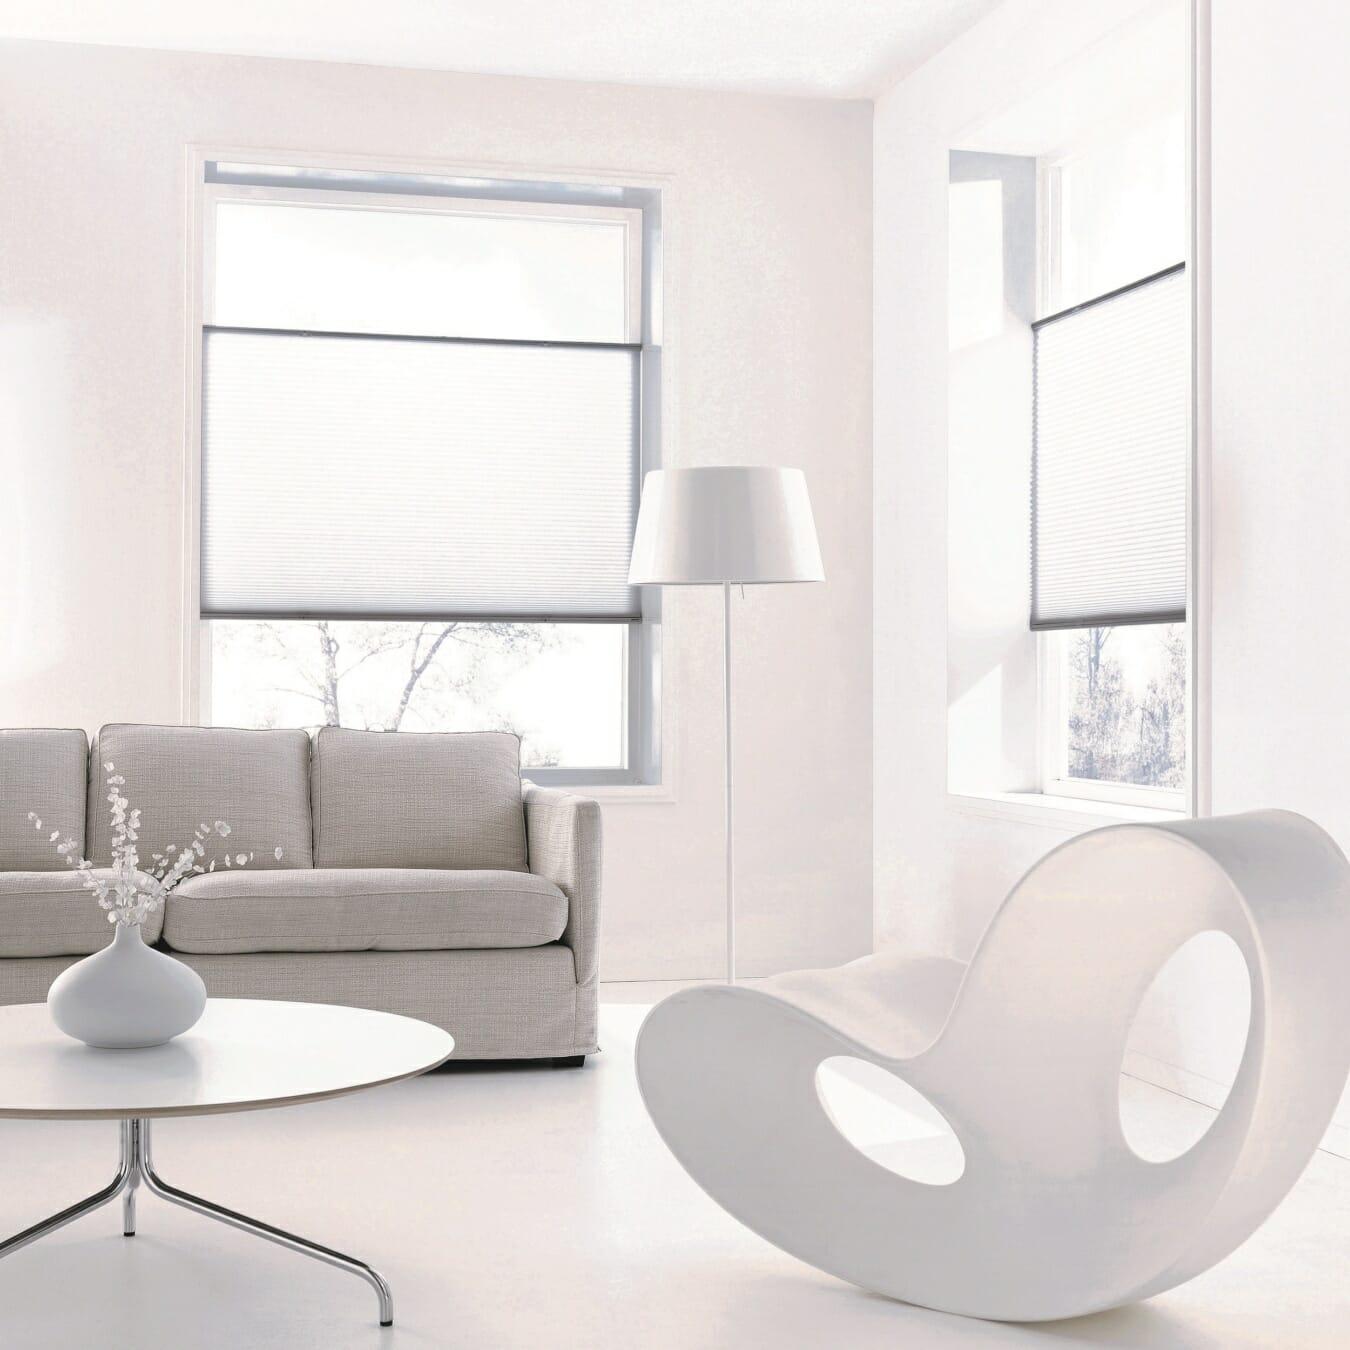 Duette® gordijnen in woonkamer